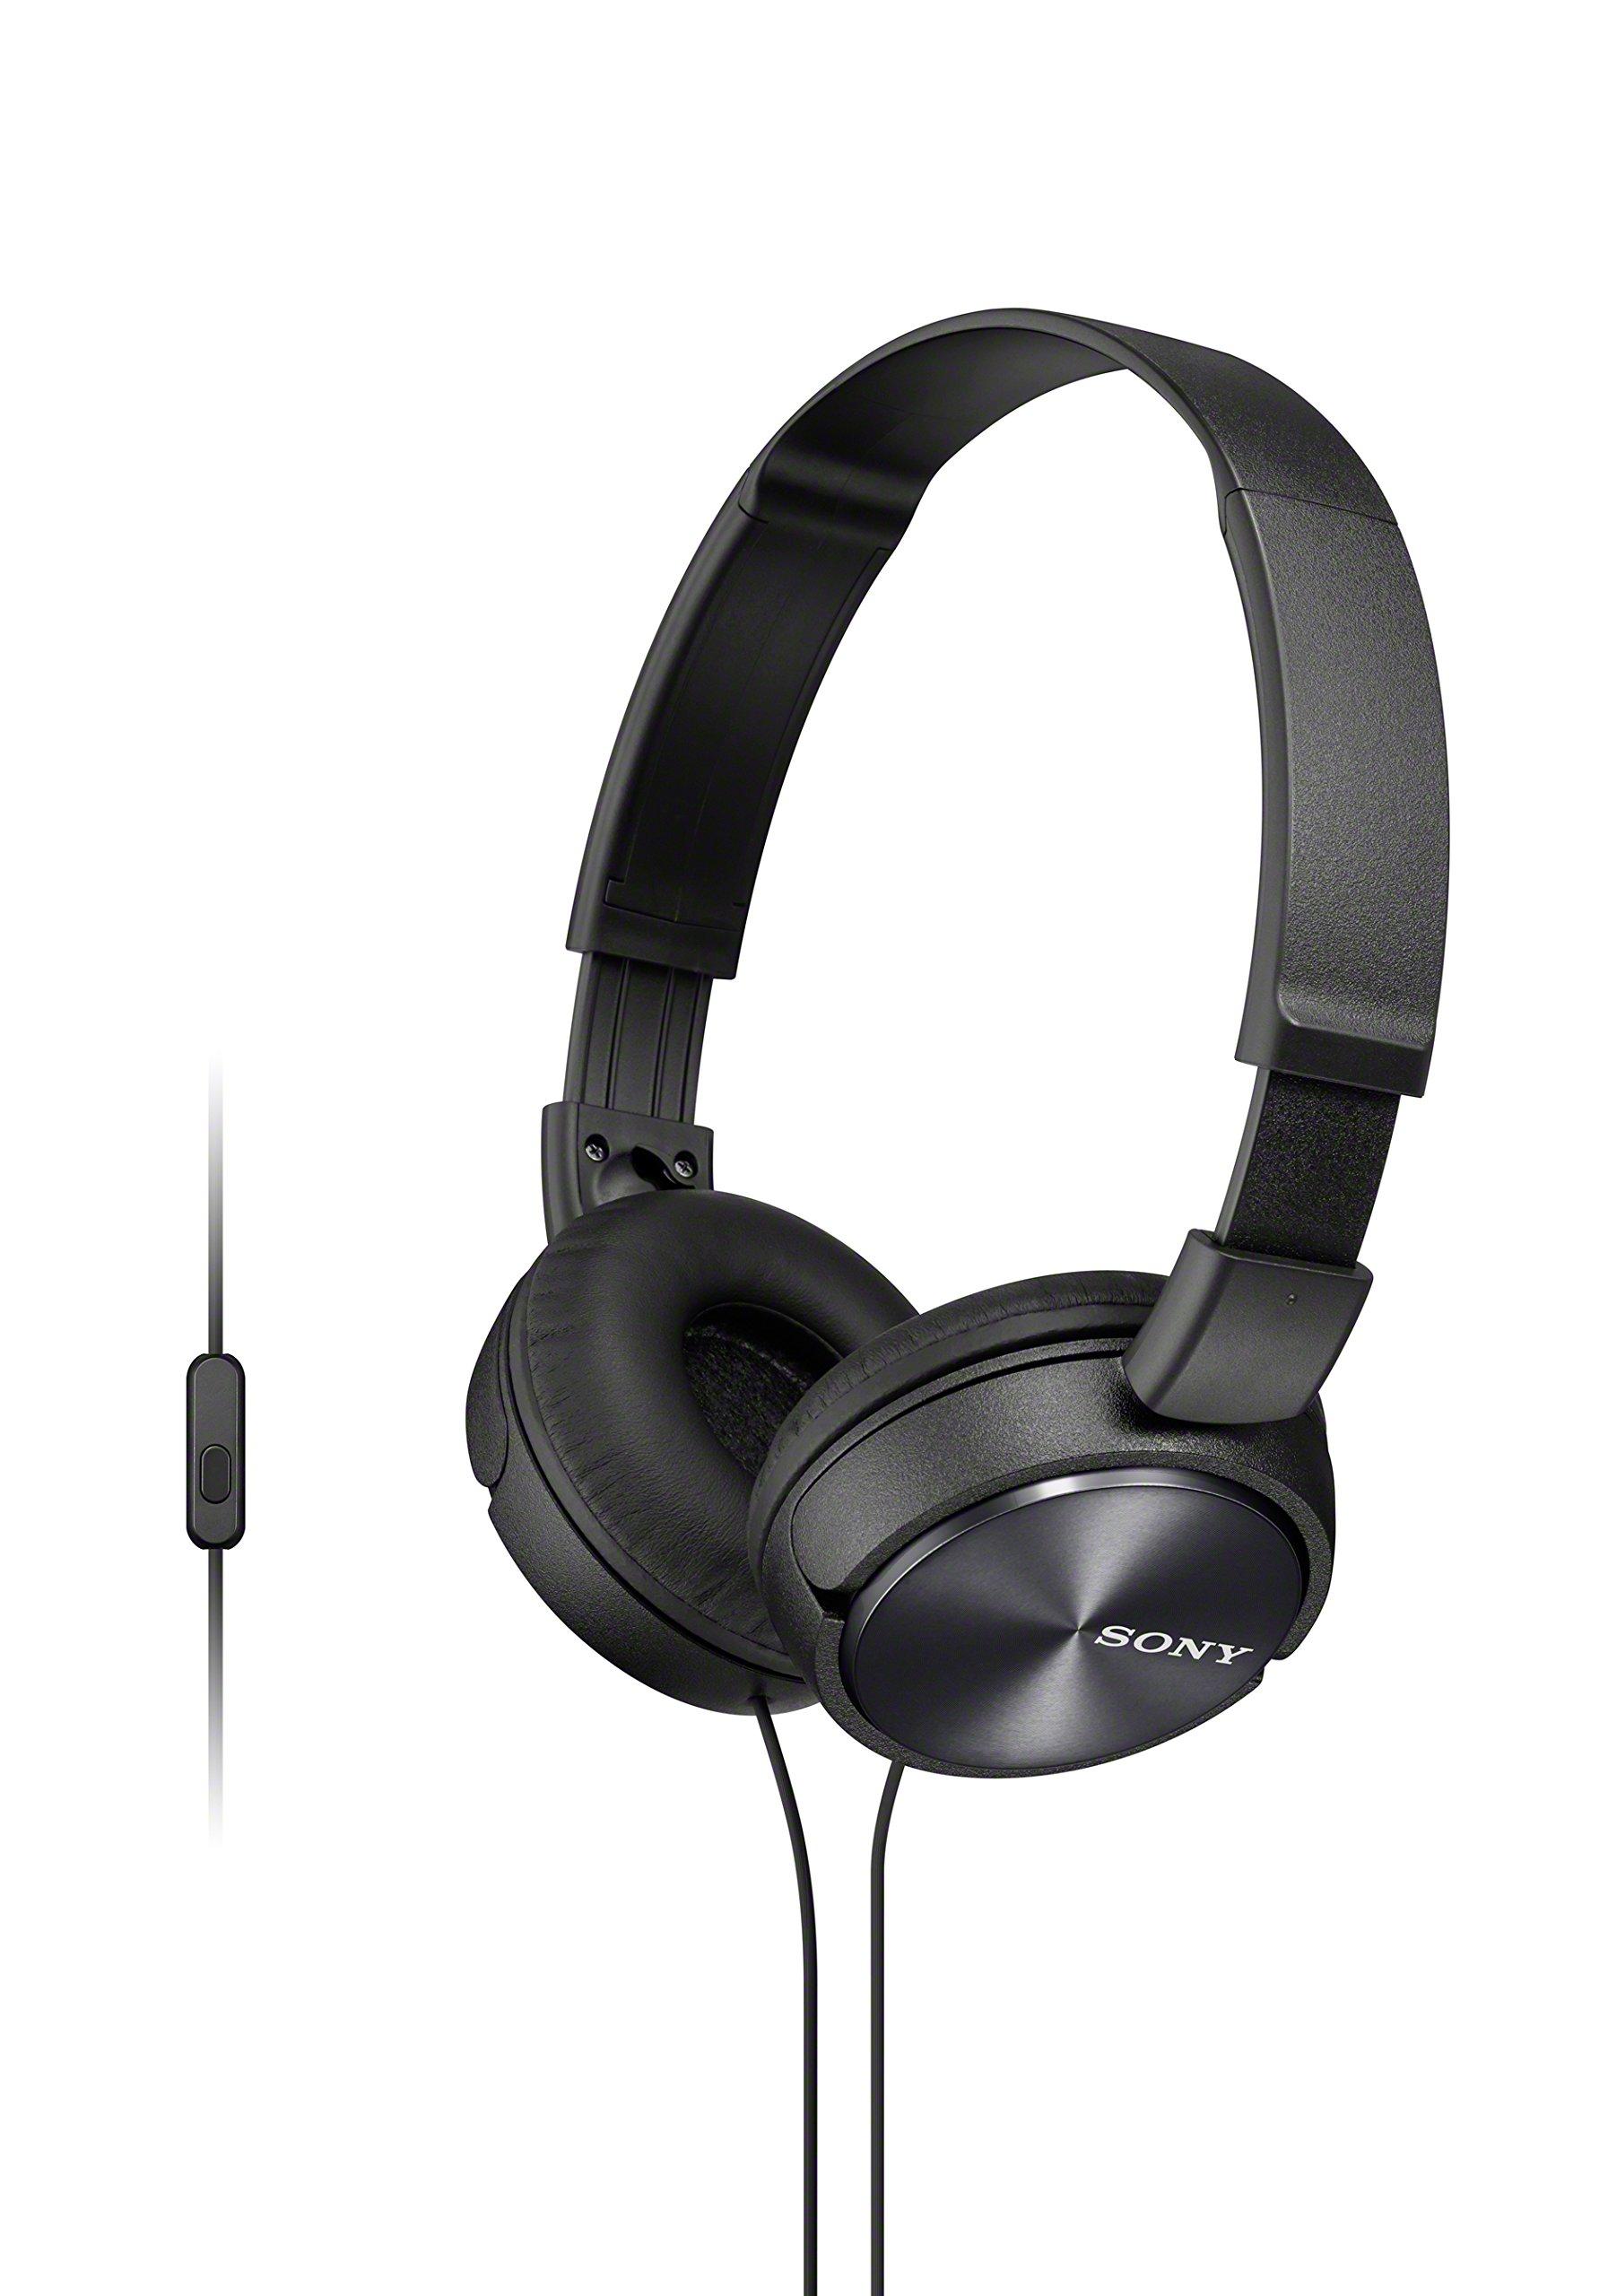 Sony Foldable Headphones Smartphone Control